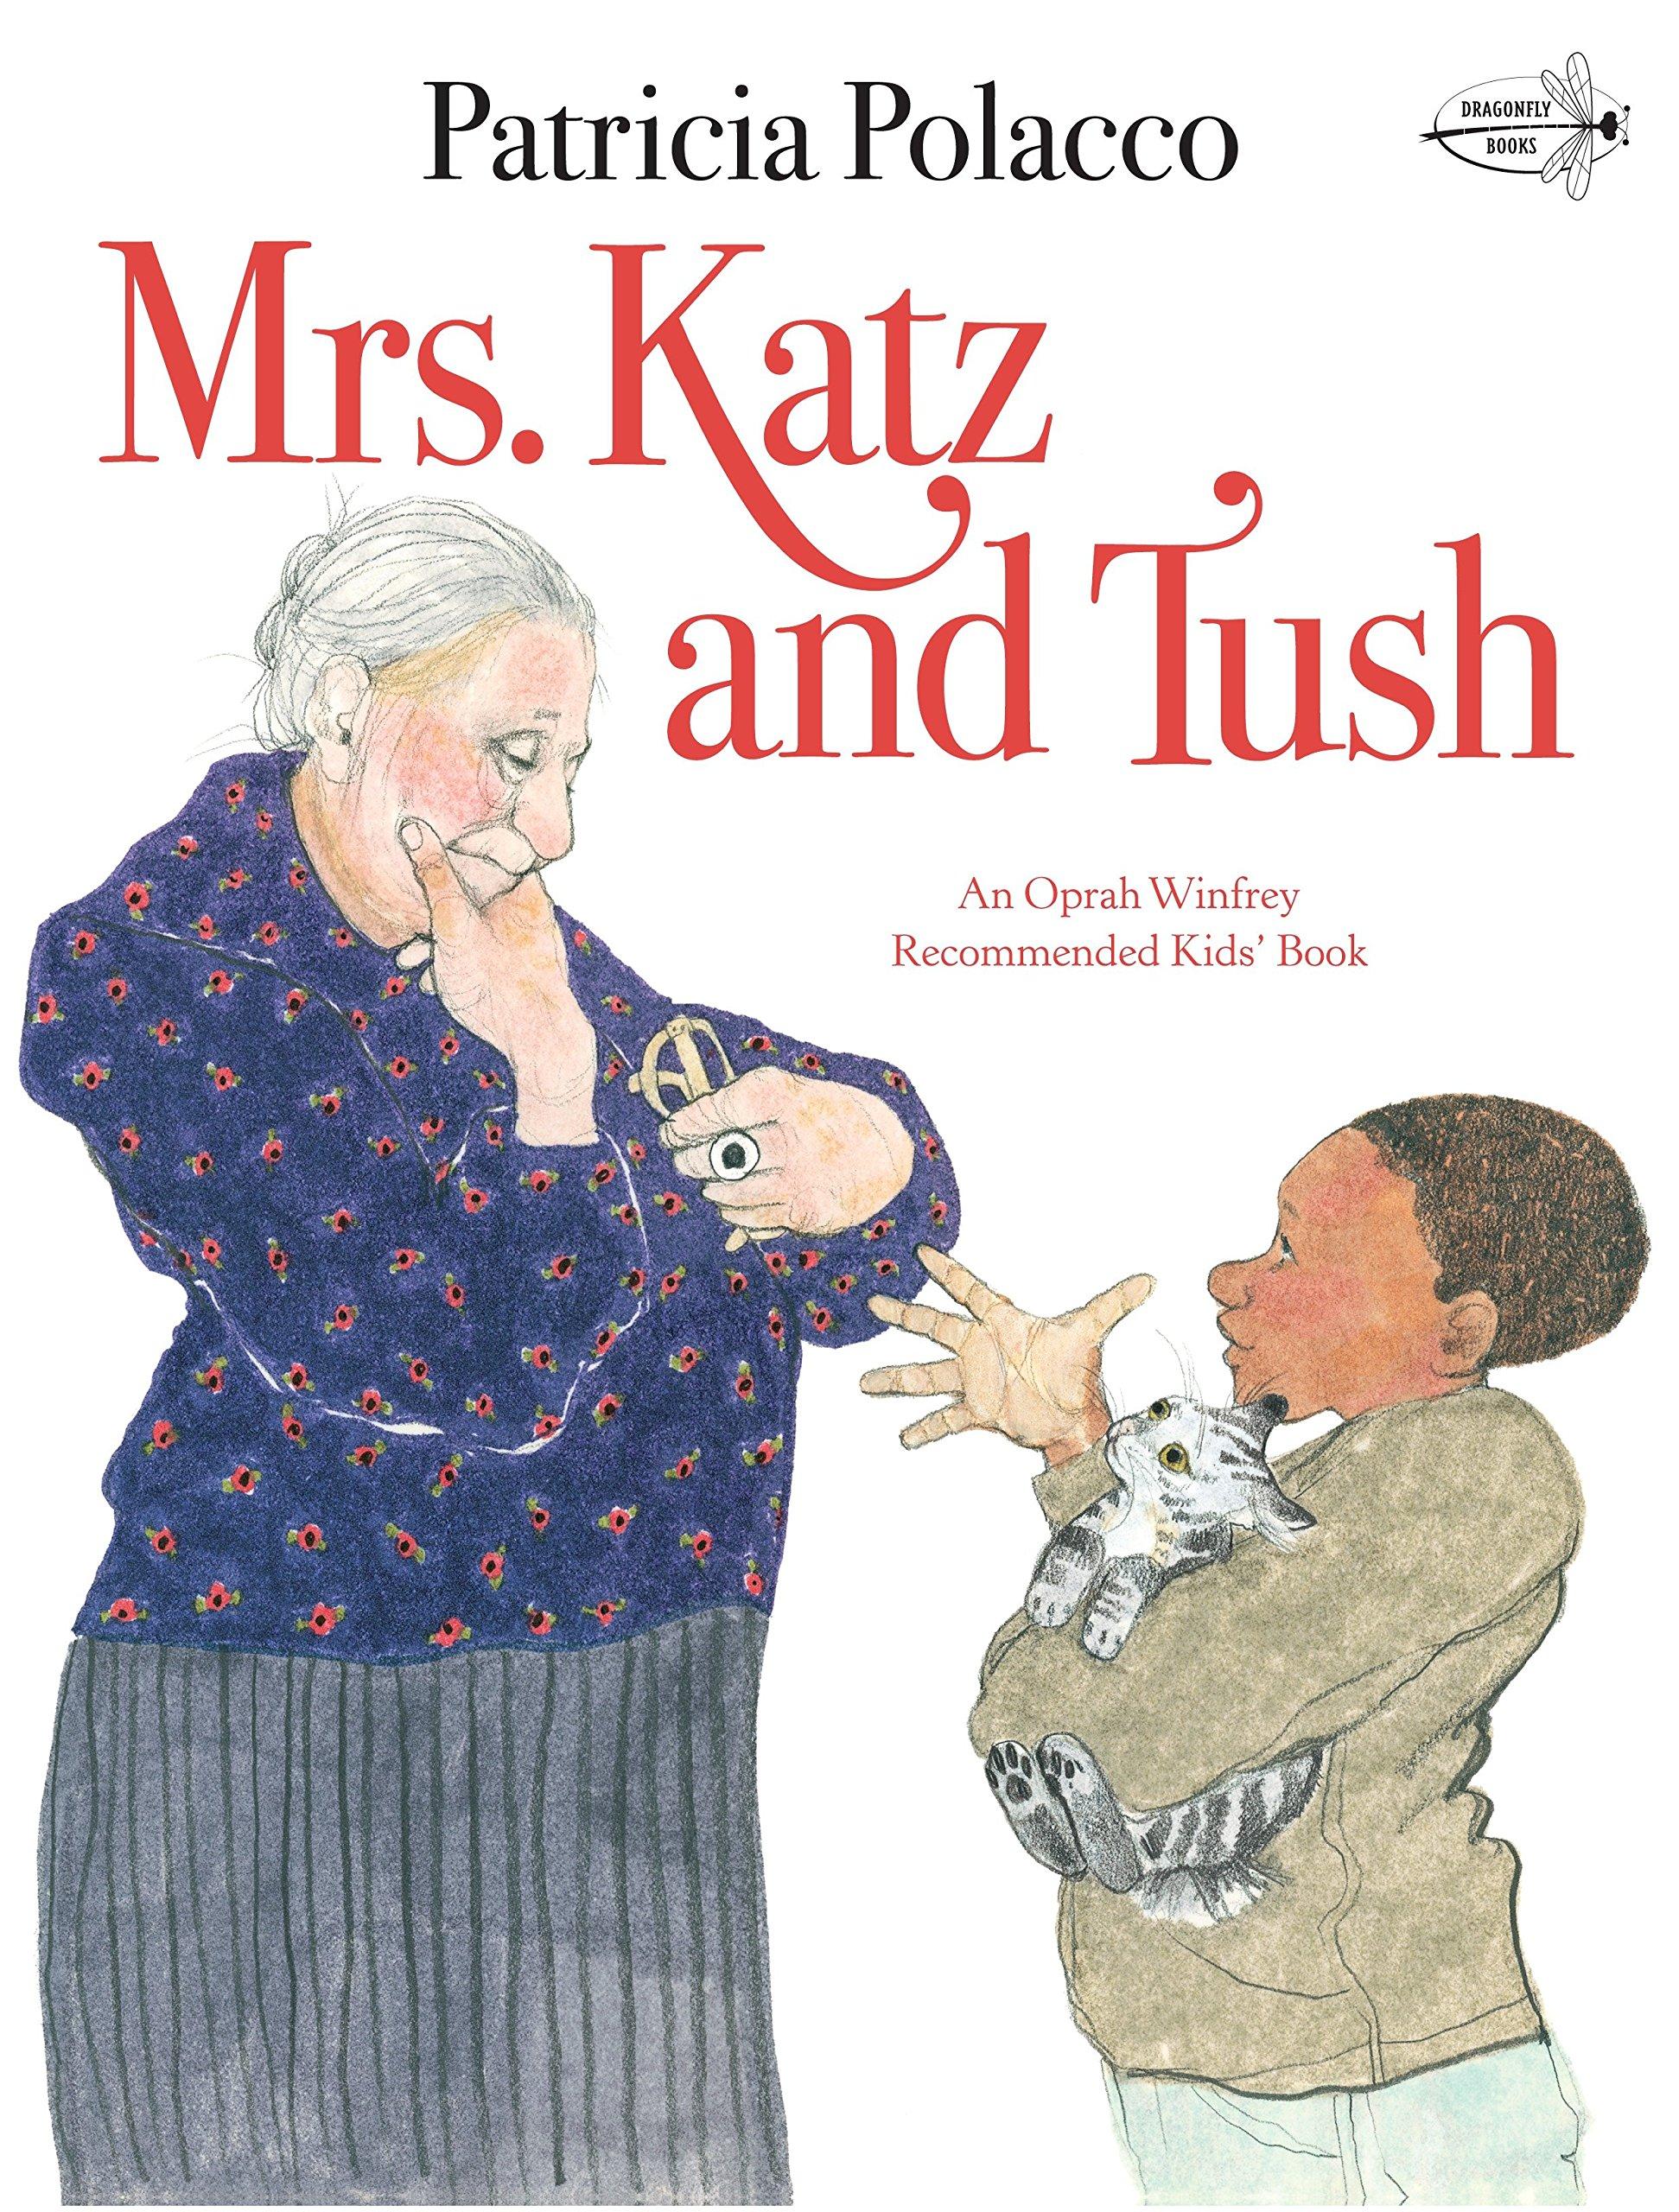 The boy and mr katz